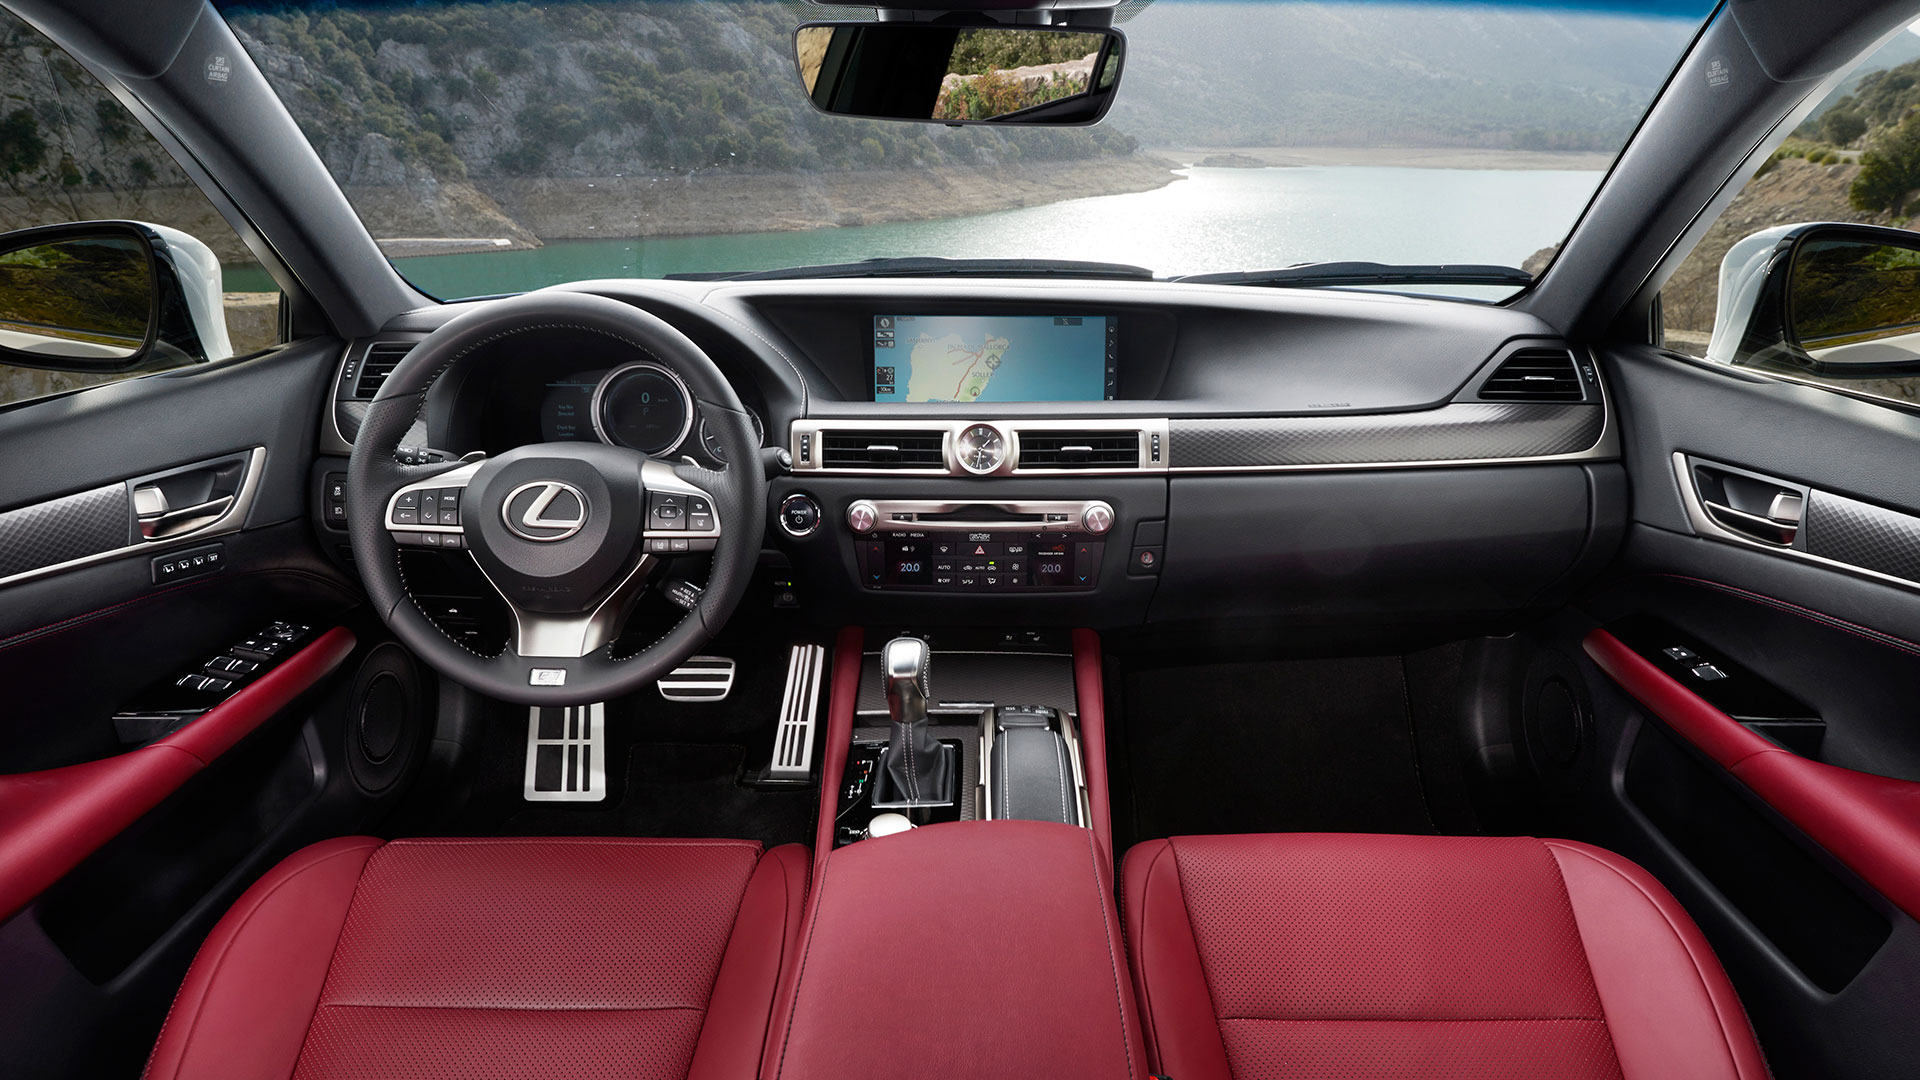 tecnología Lexus TouchTM hero asset